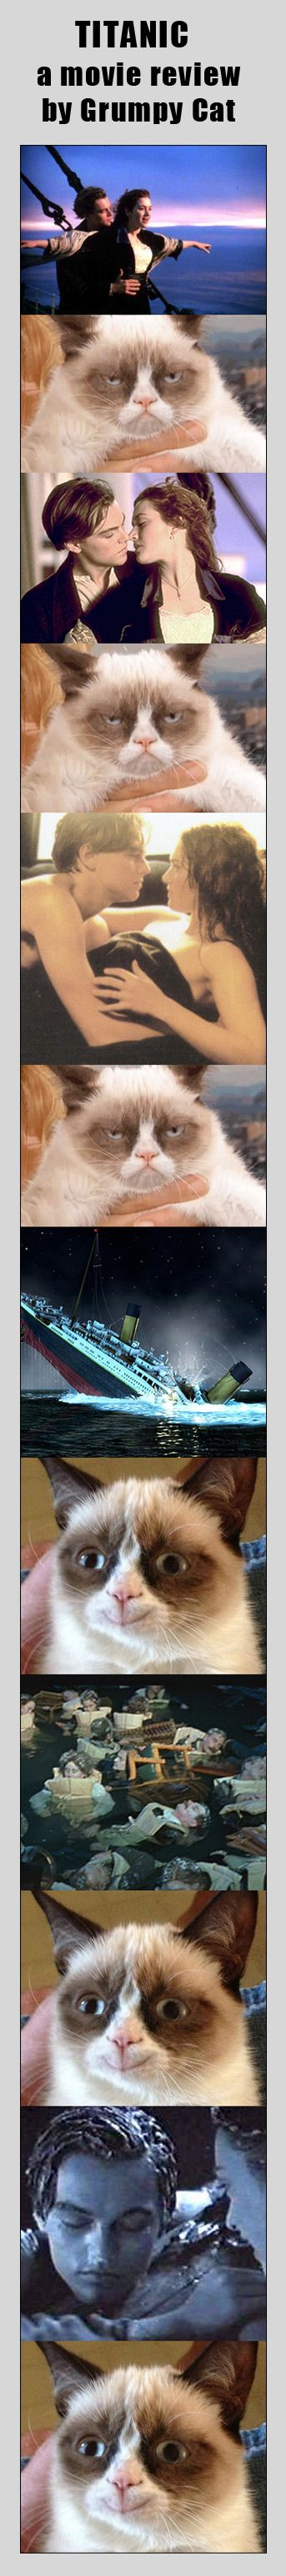 Tard the Grumpy Cat reviews the Titanic movie (Please